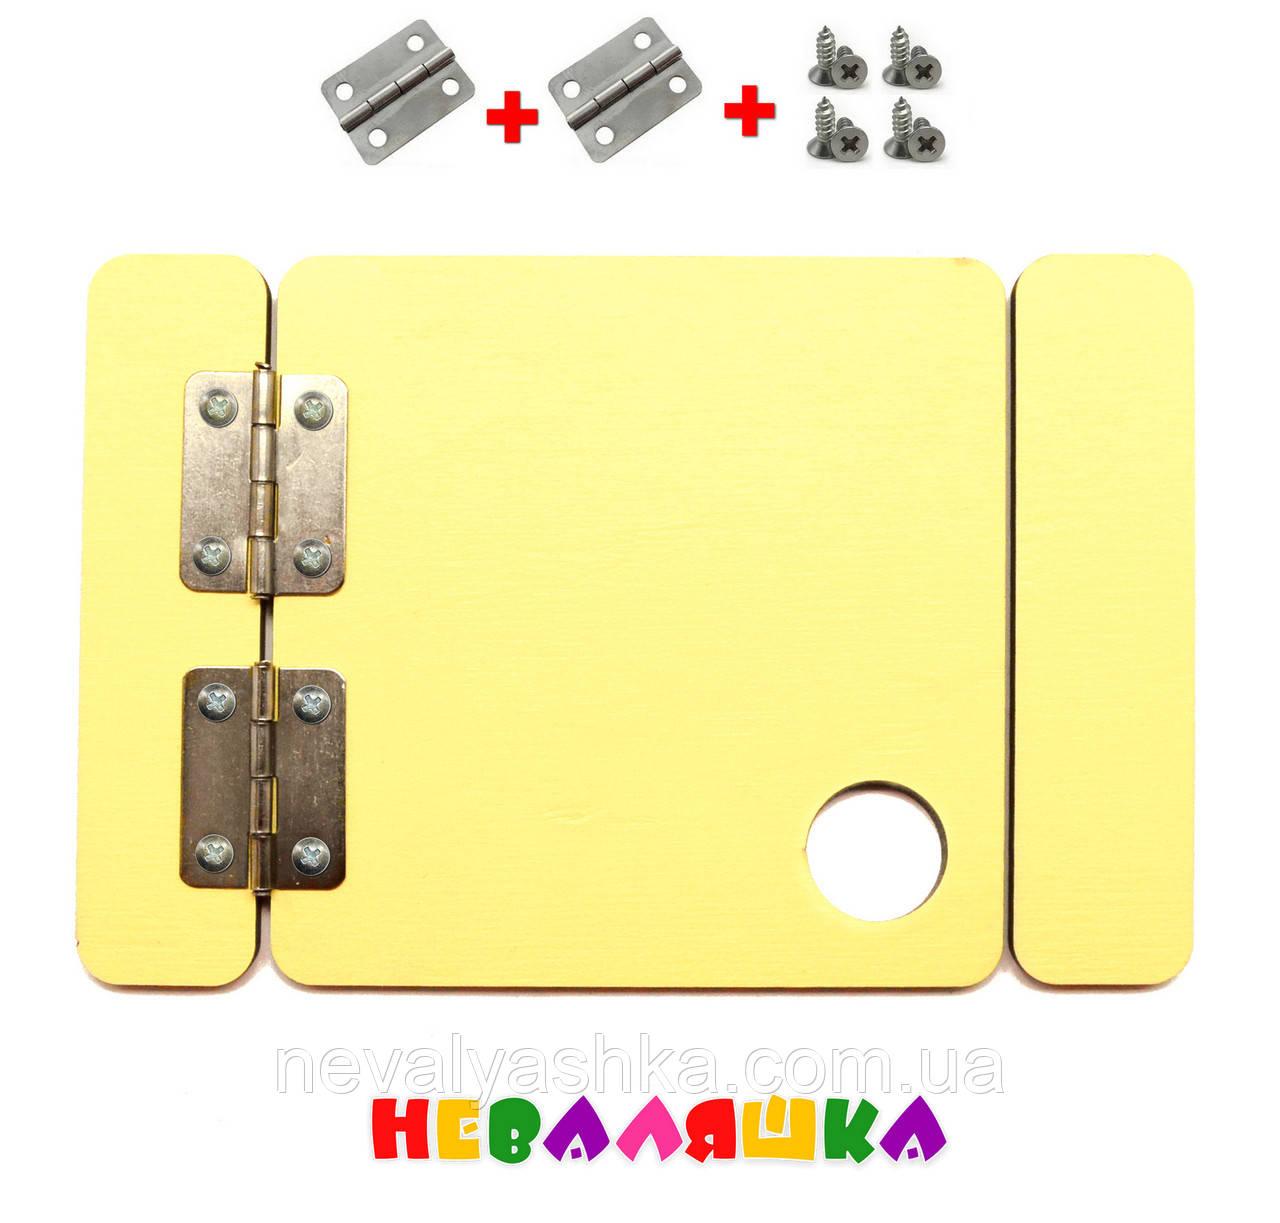 Заготовка для Бизиборда Желтая Дверка 8 см + Петли + Саморезы  дверца Дерев'яні двері бізіборда